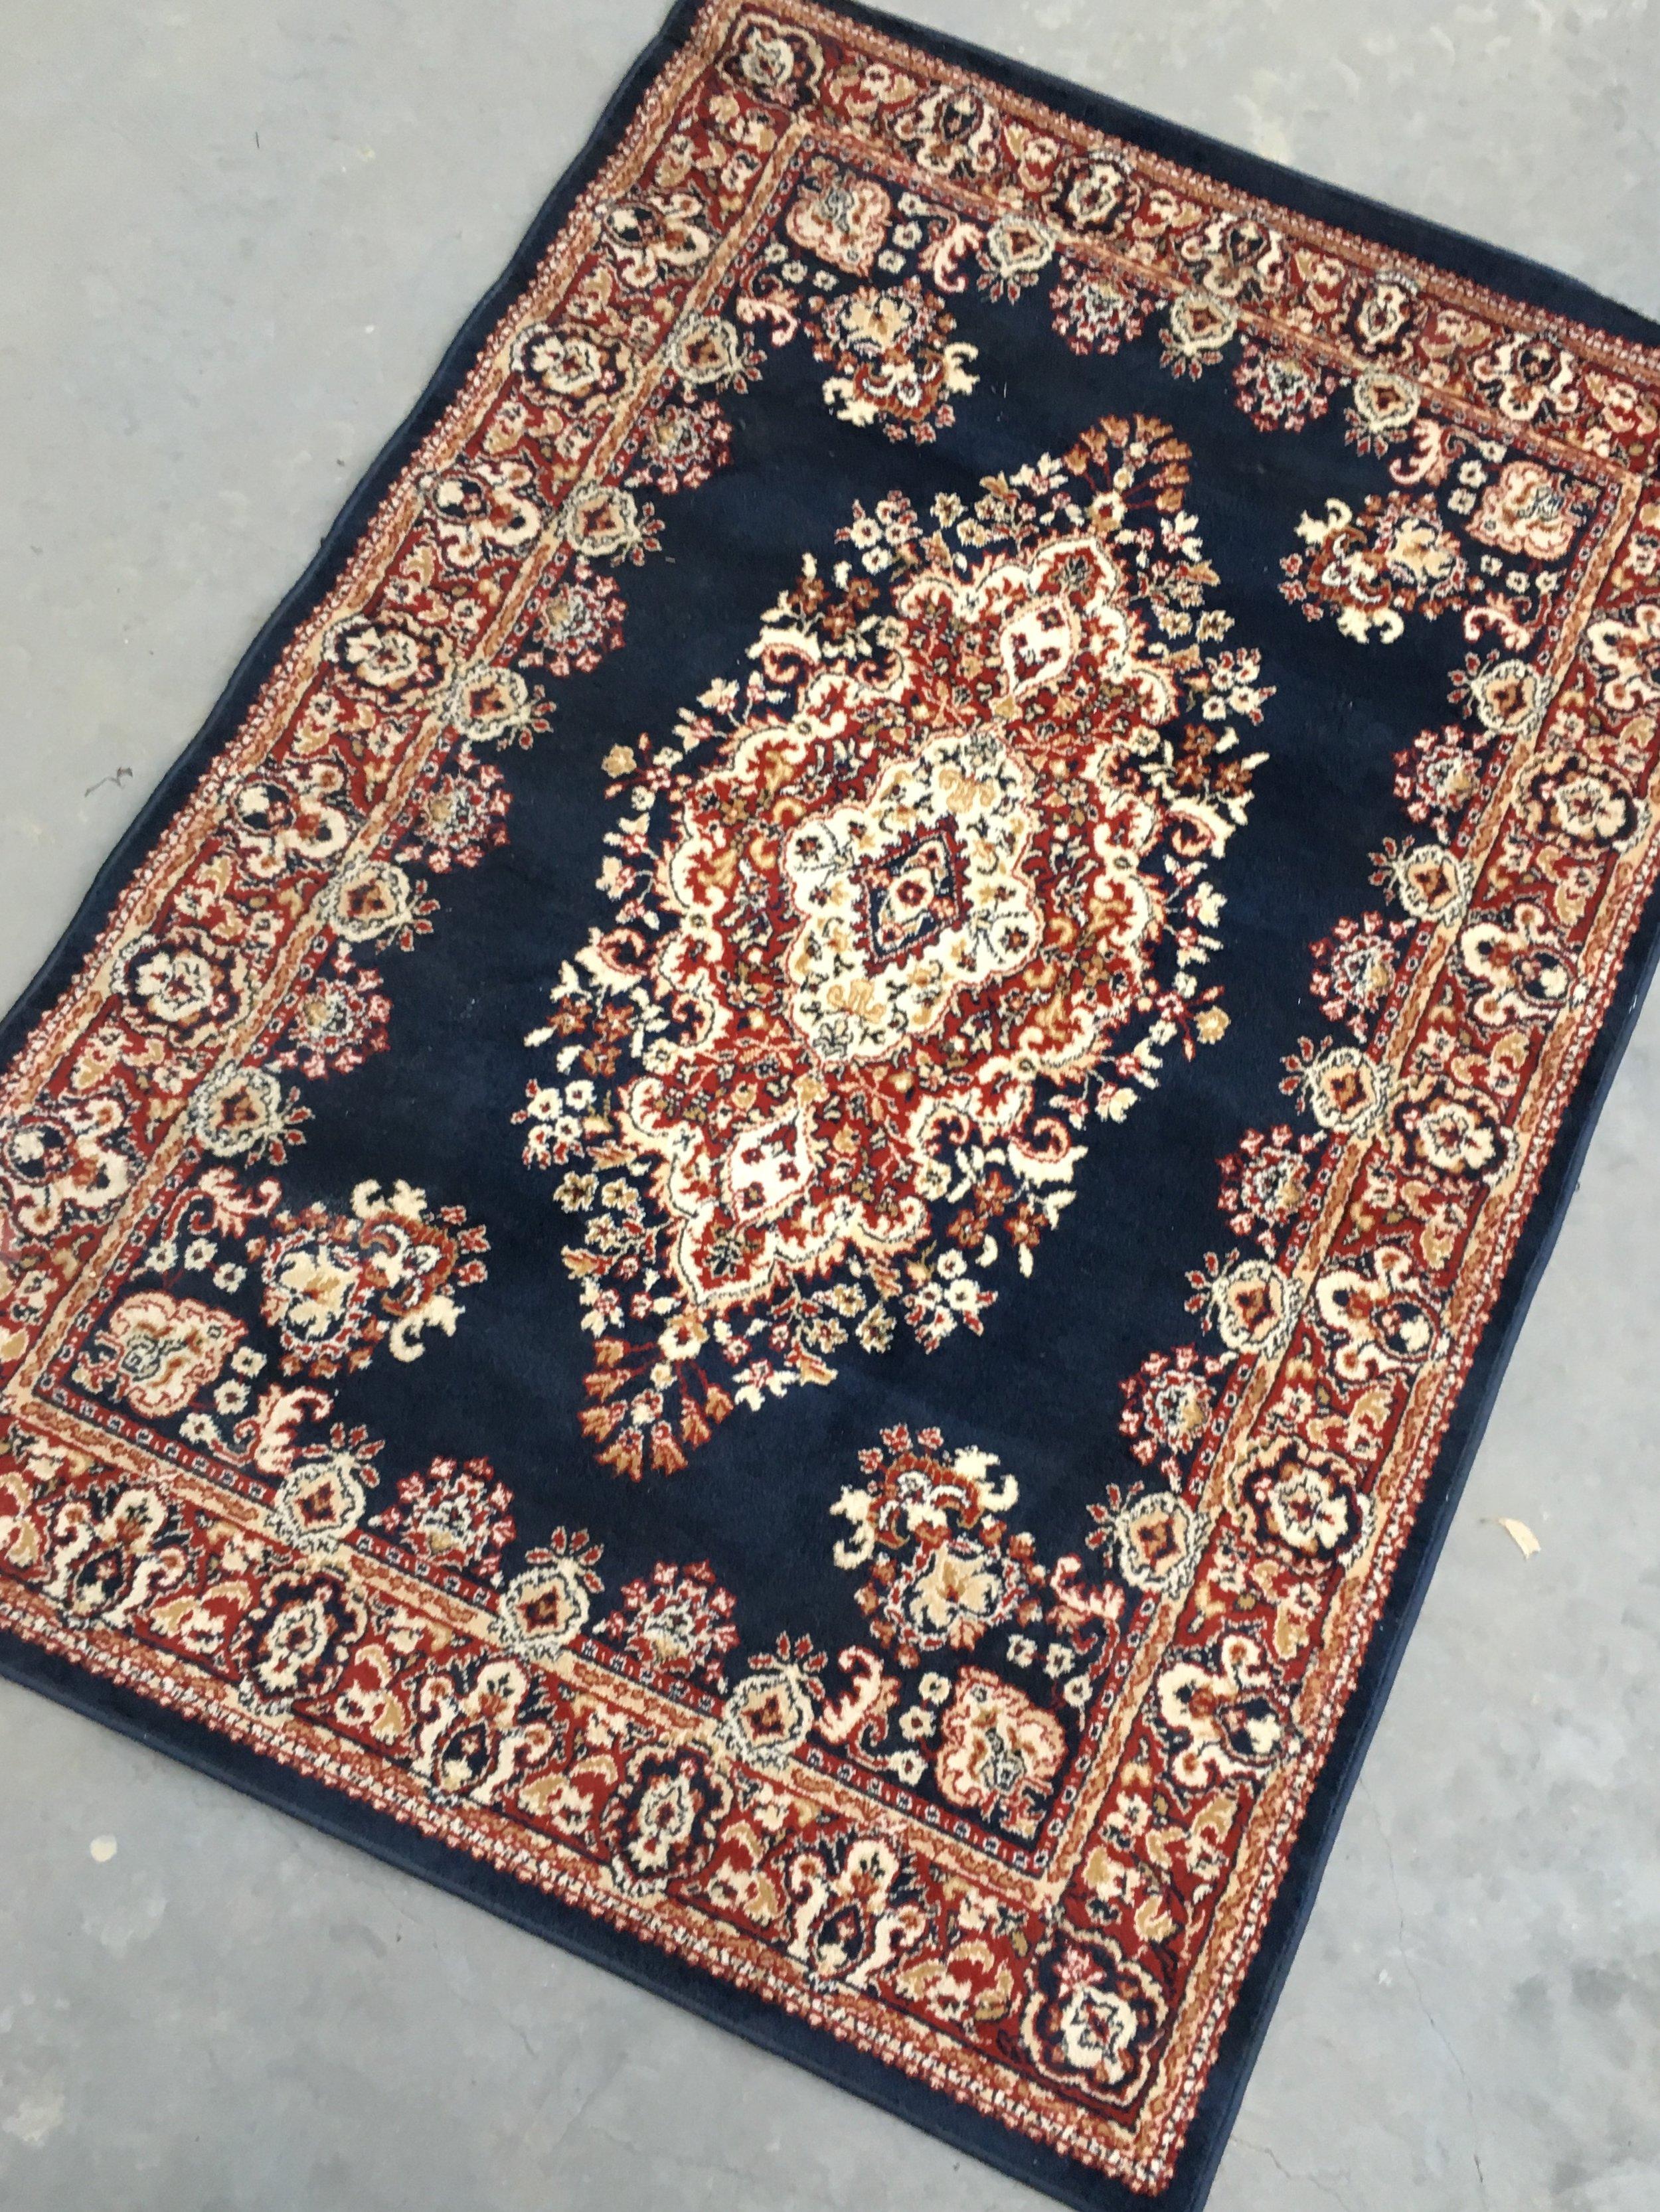 Blue Persian Rug  1.6m x 2.3m  $45